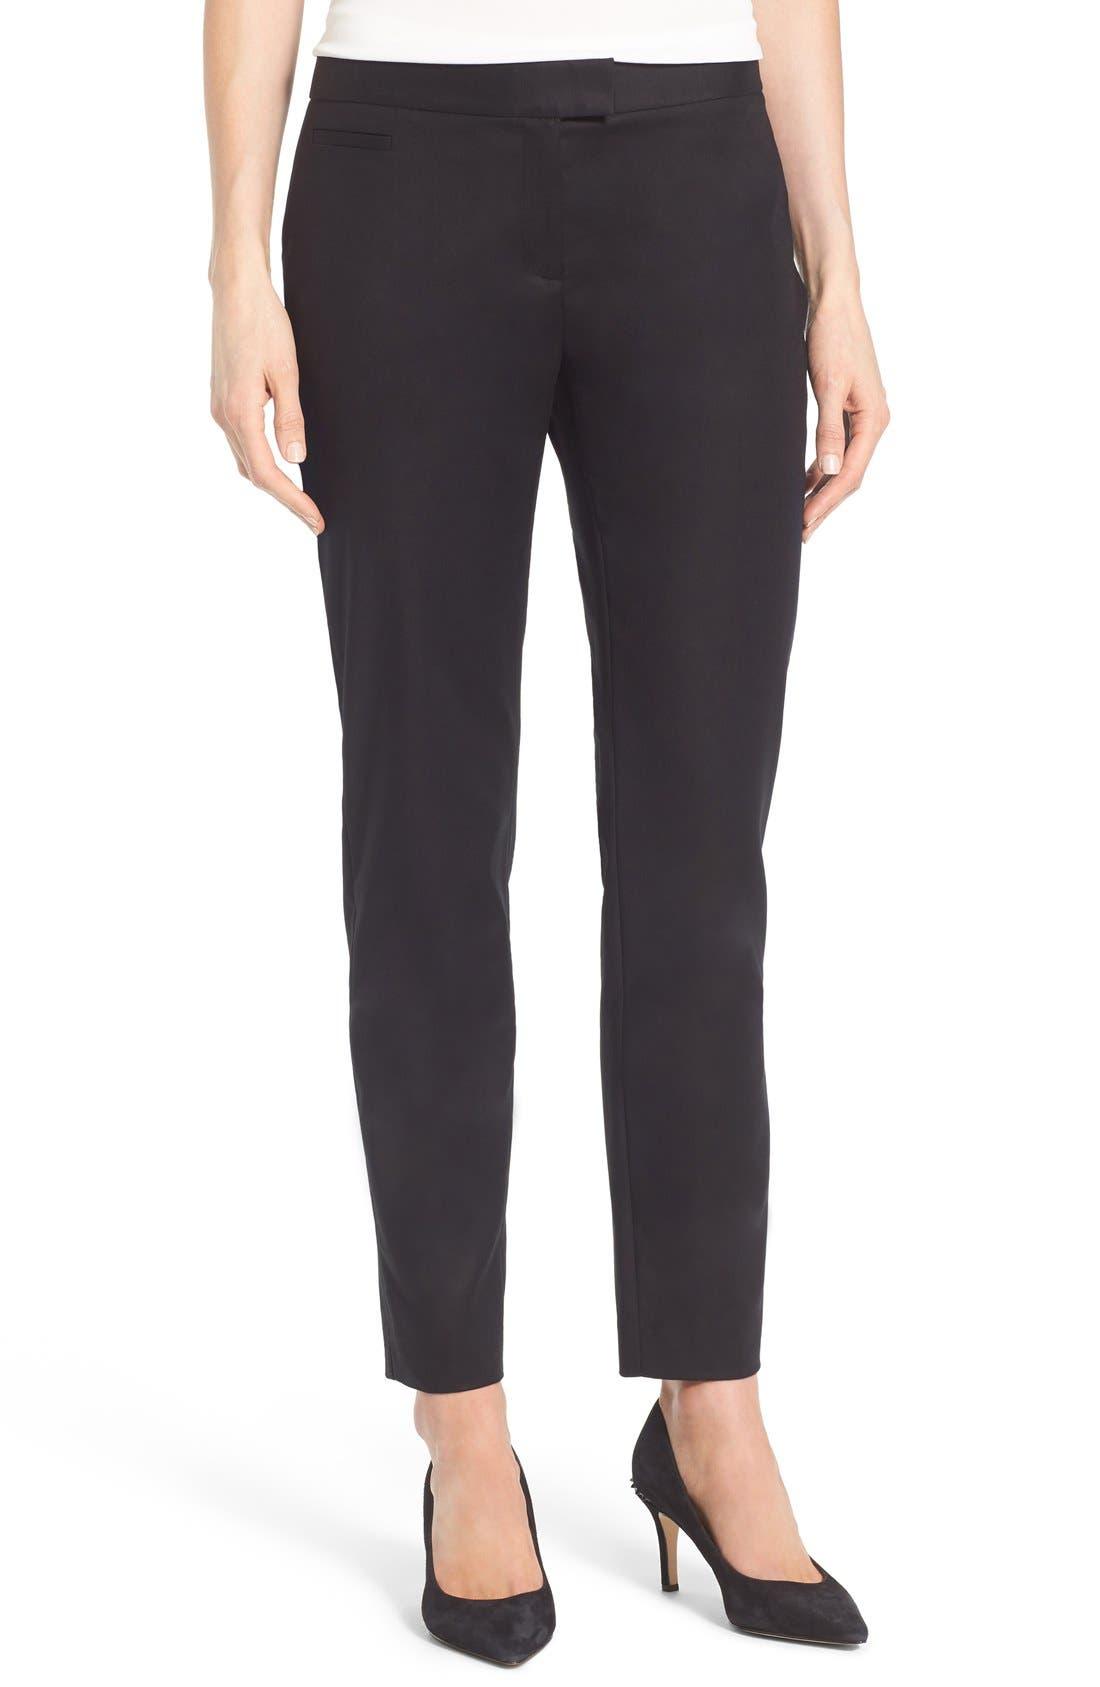 Alternate Image 1 Selected - Cece Double Weave Slim Pants